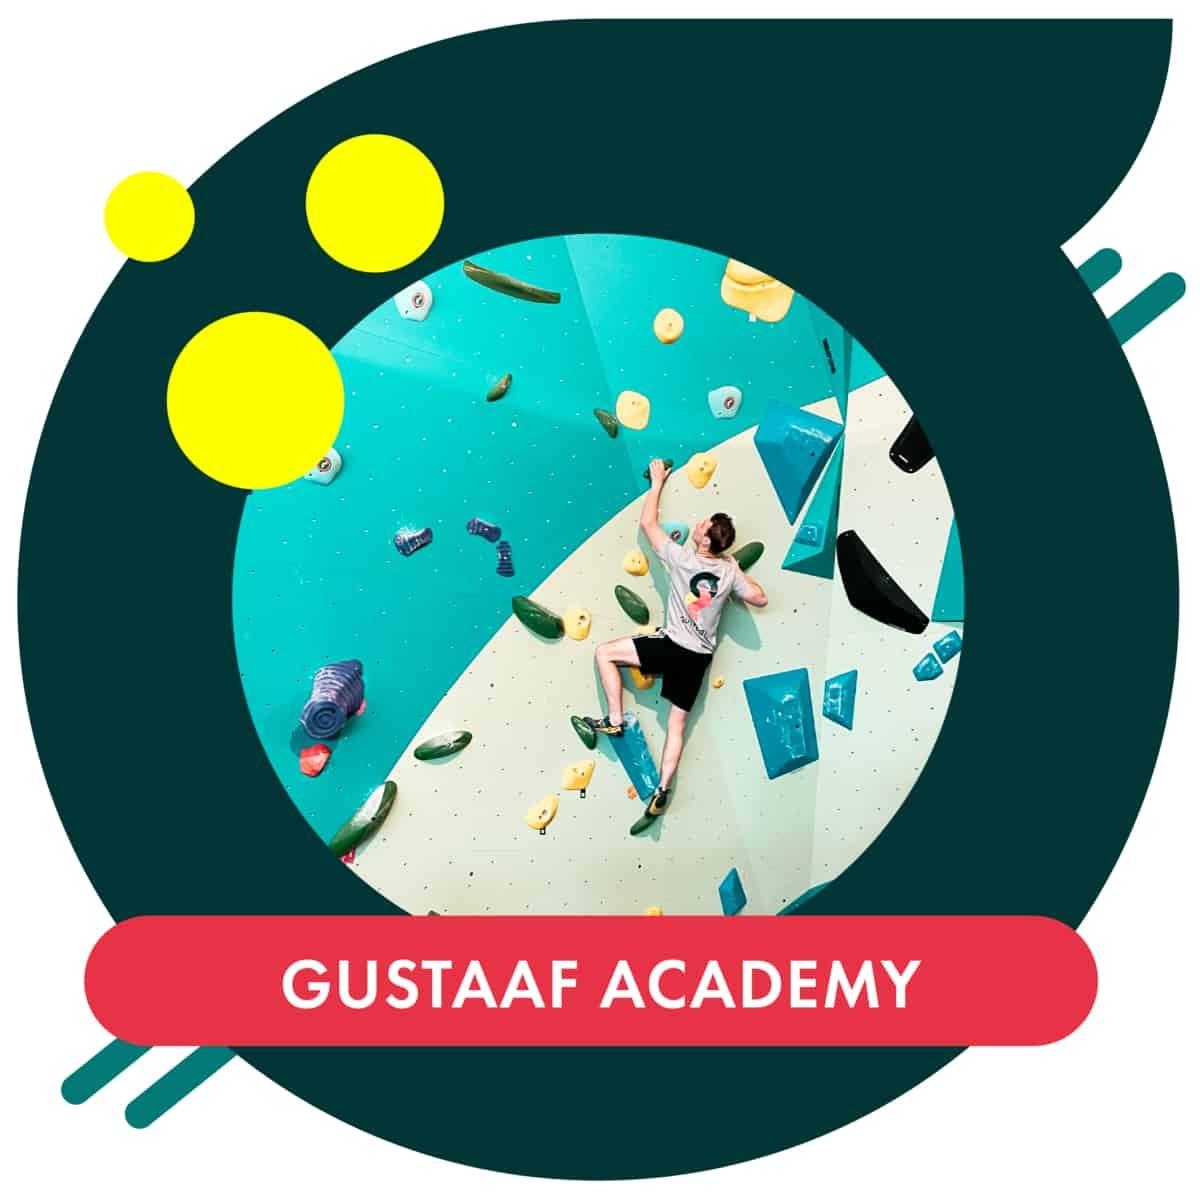 website foto en visuals gustaaf 09